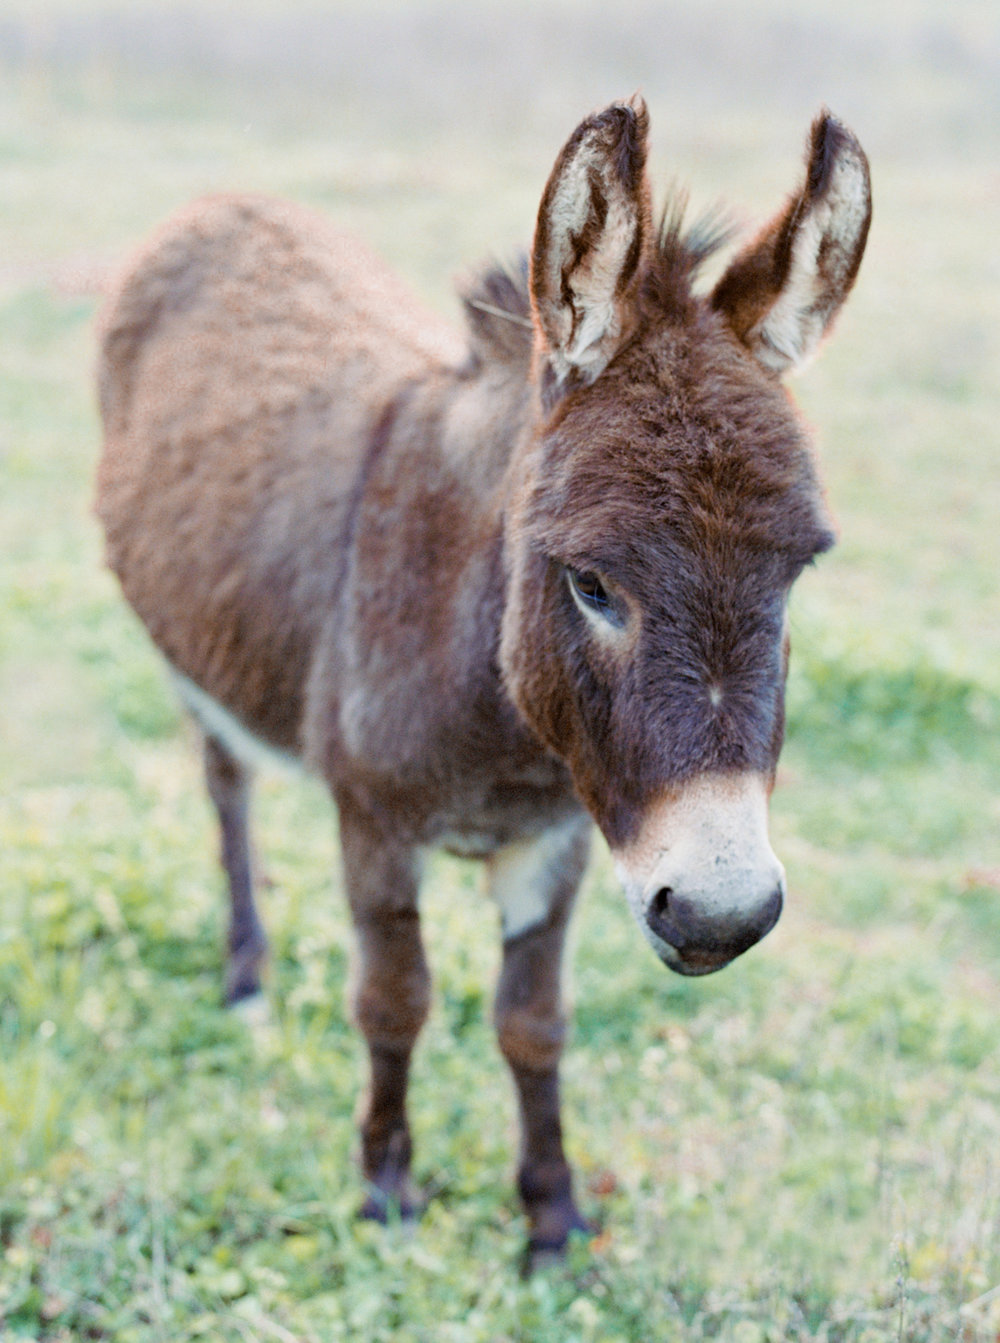 hannah forsberg atlanta wedding photographer whitney spence anniversary session with miniature donkeys and horse-11.jpg